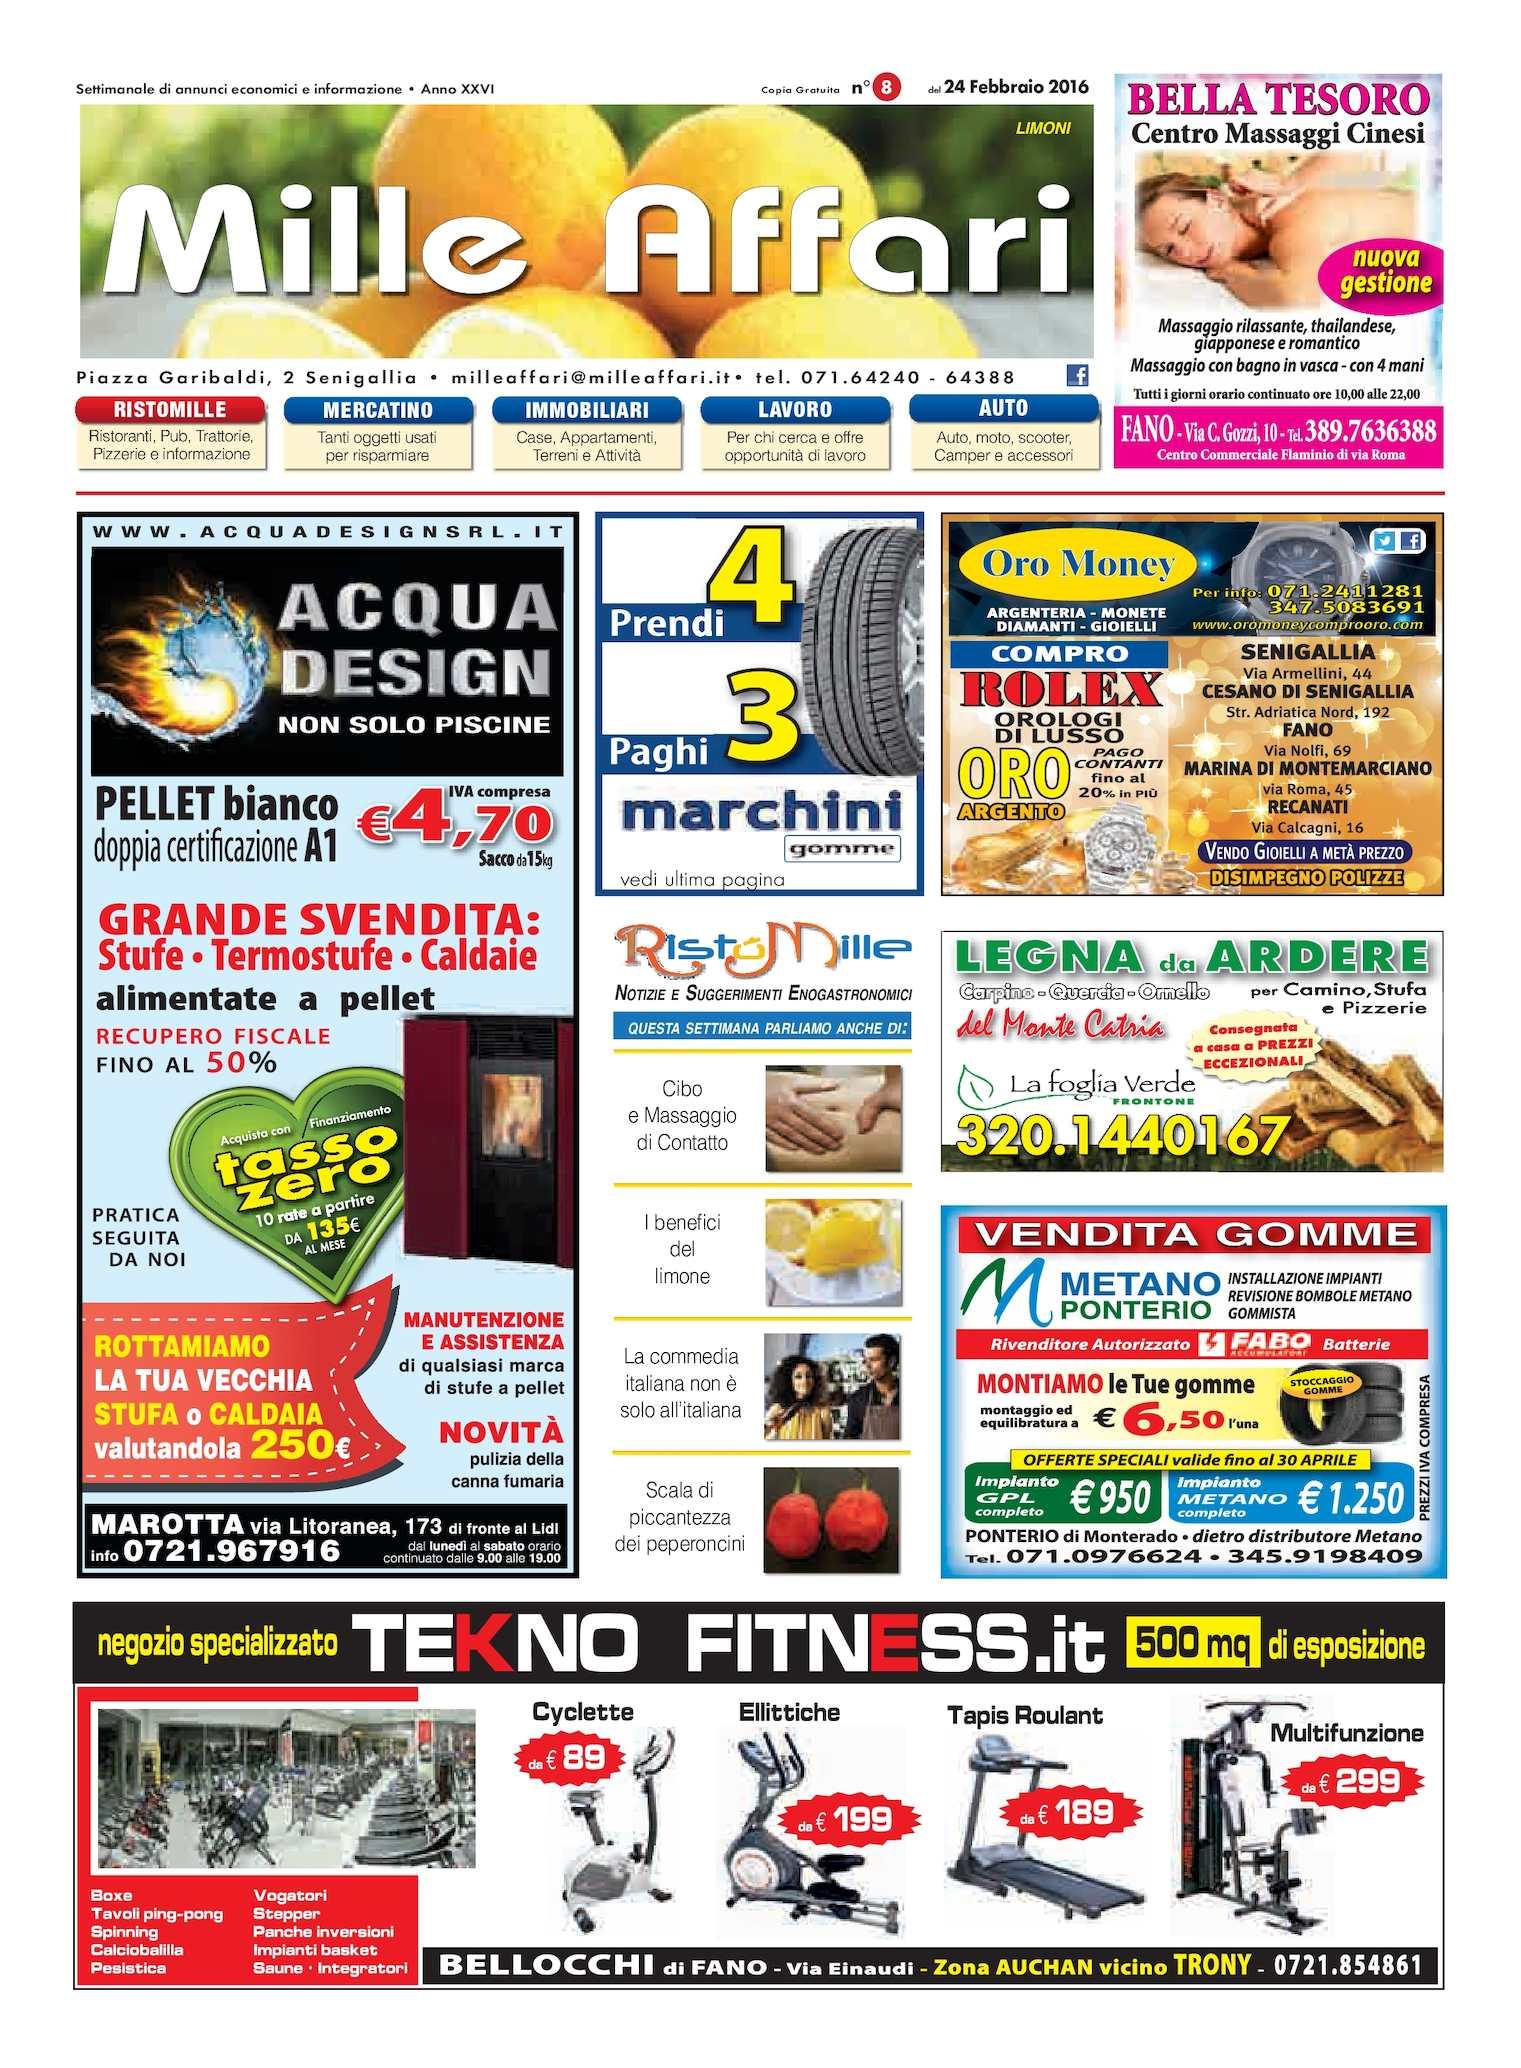 online store 2a8f7 933a0 Calaméo - MILLEAFFARI N°08 DEL 24.02.16